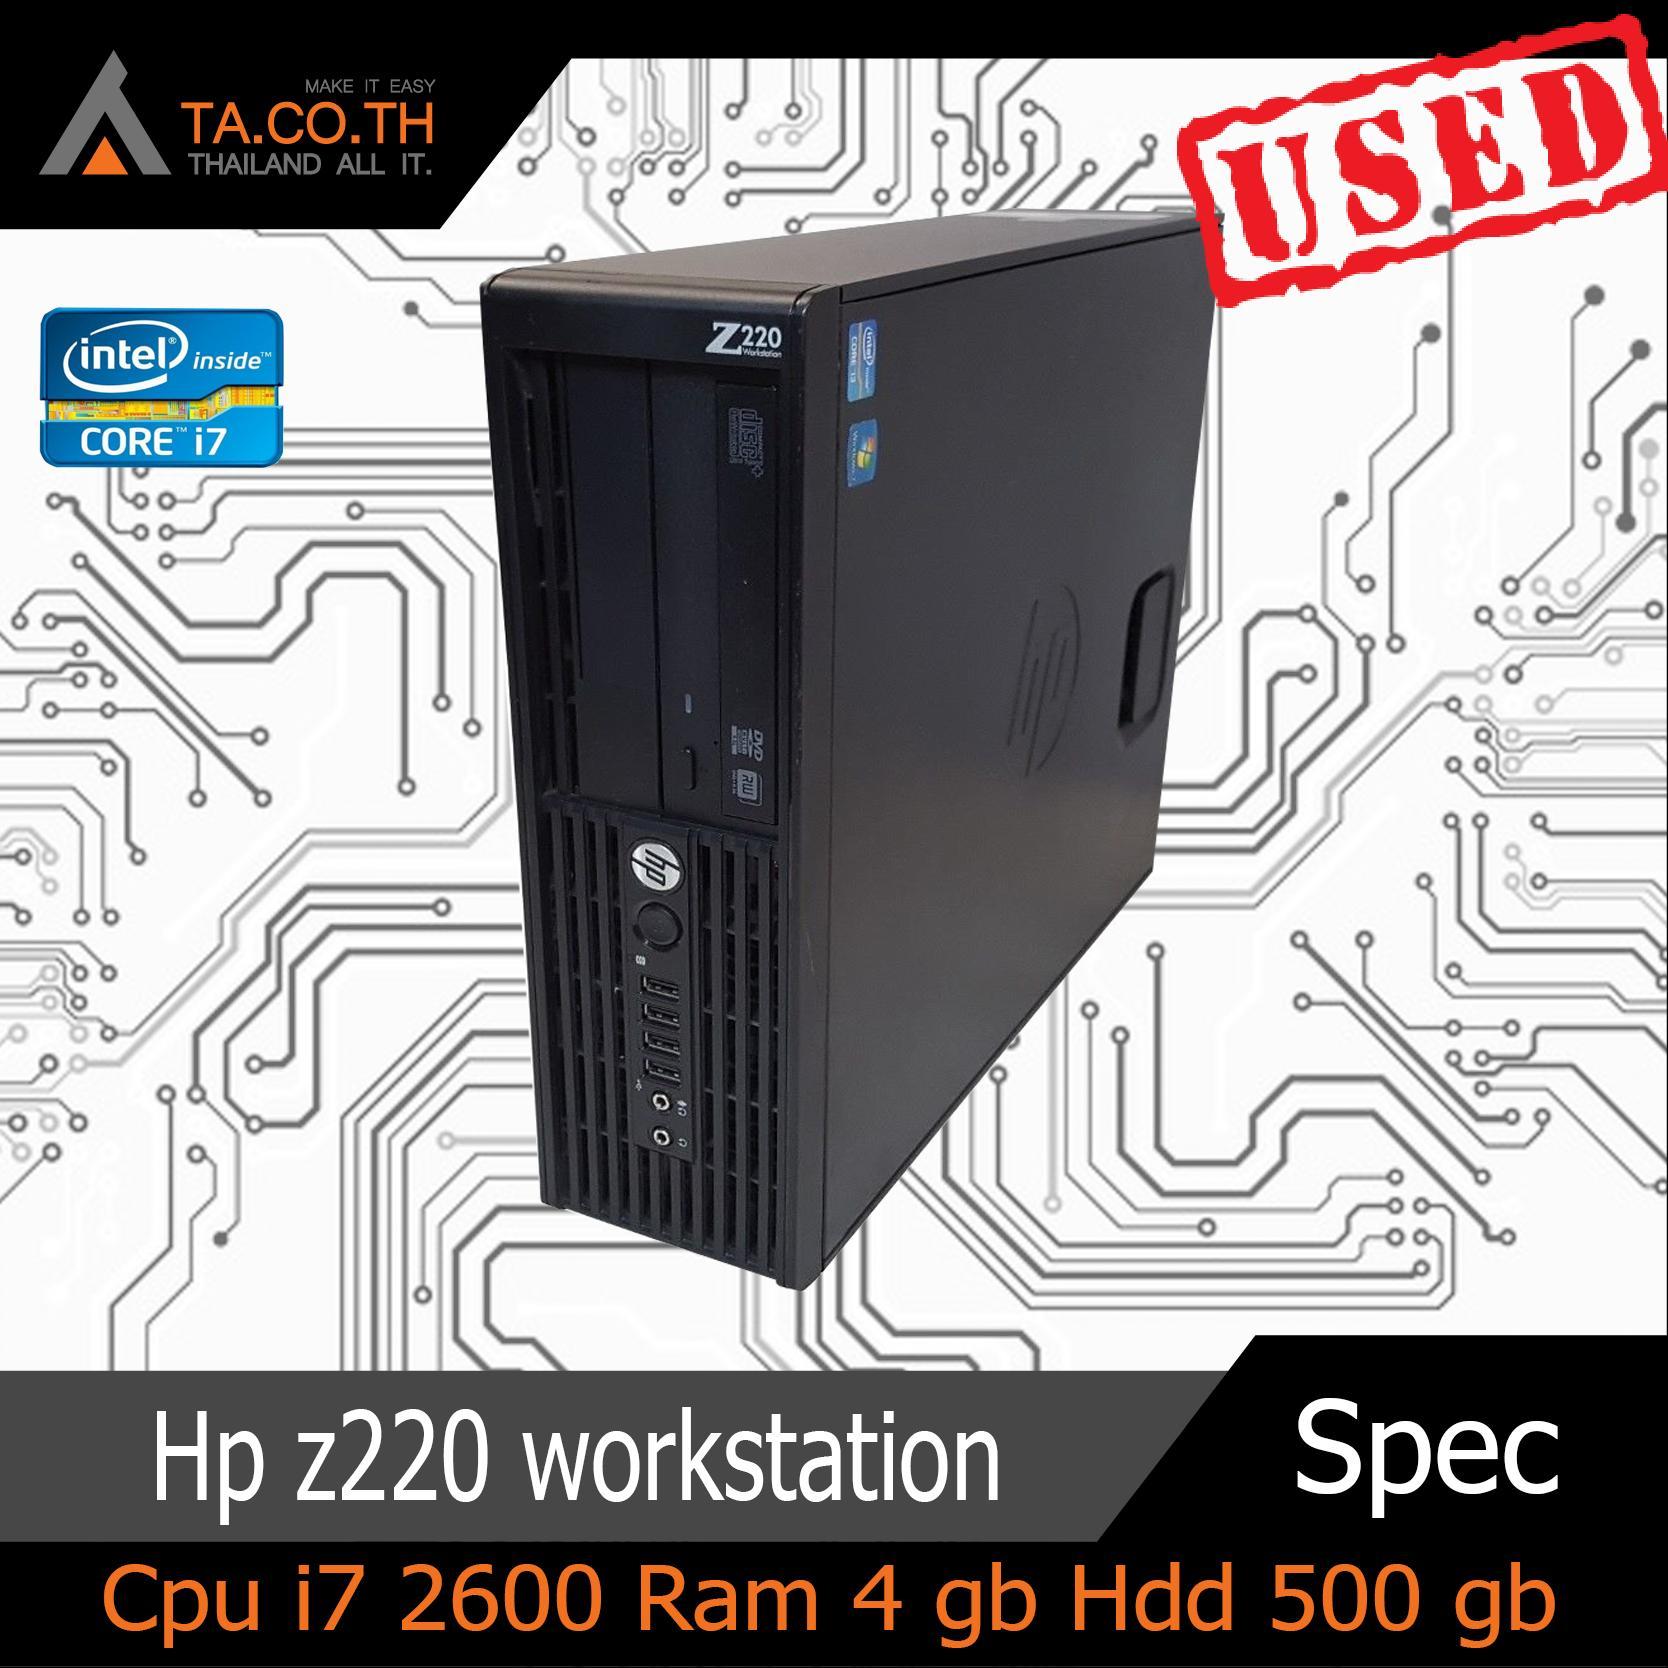 Hp Z220 Workstation เครื่องที่เป็นมากกว่า Pc เหมาะสำหรับการใช้งานห